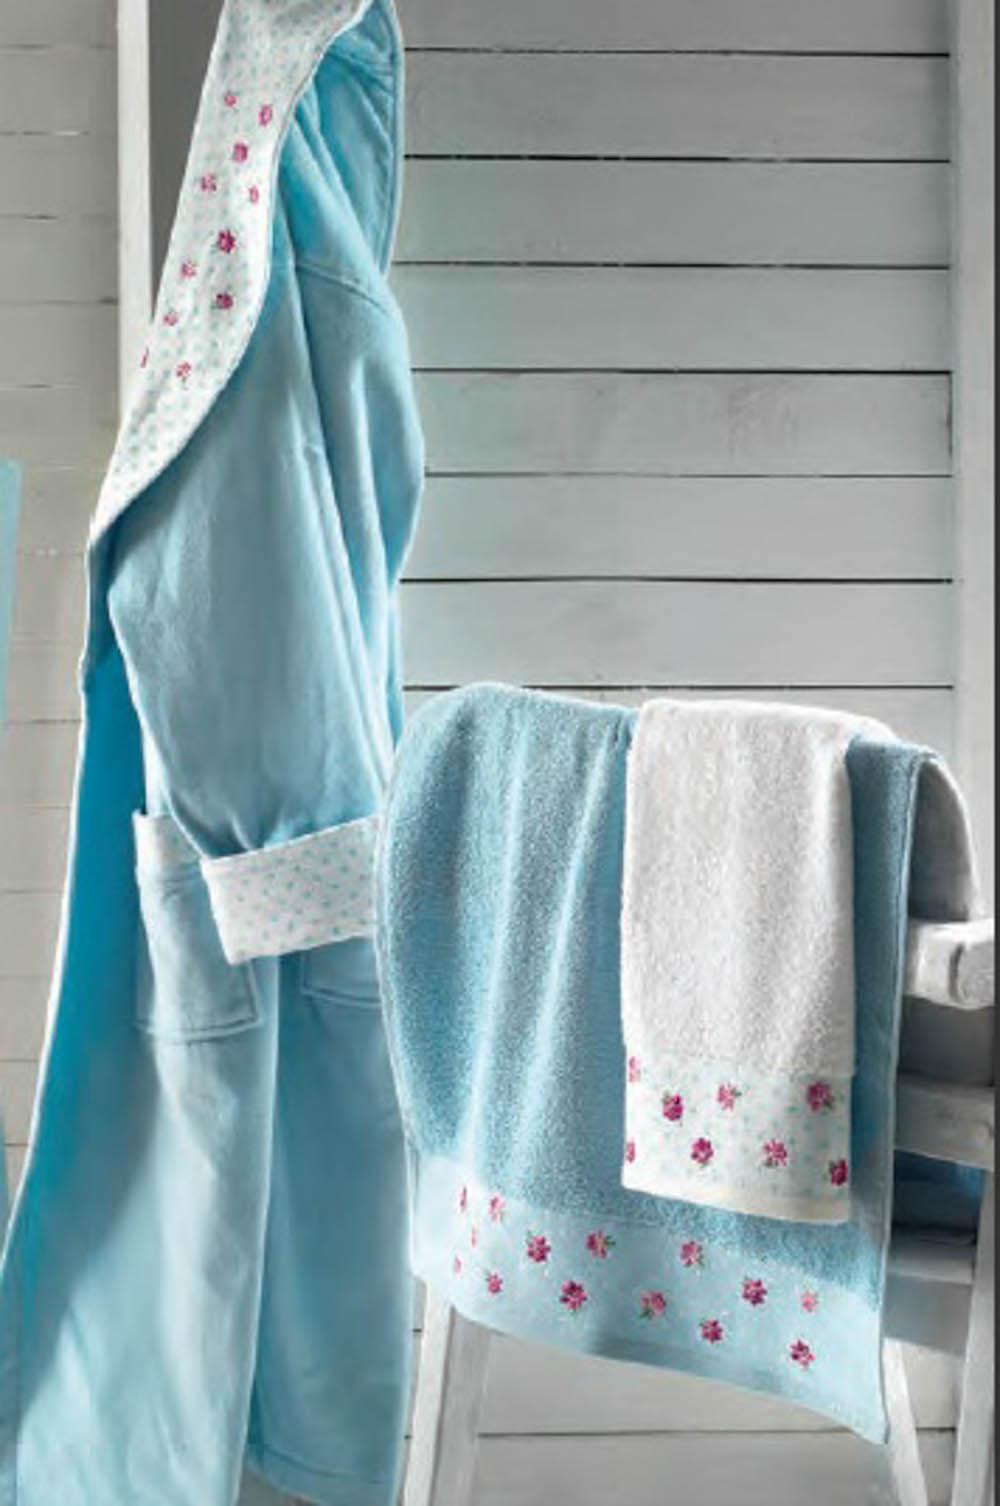 Полотенца Roseberry Полотенце Attacco Цвет: Бирюзовый (30х50 см) cite marilou полотенце 30x50 цвет голубой